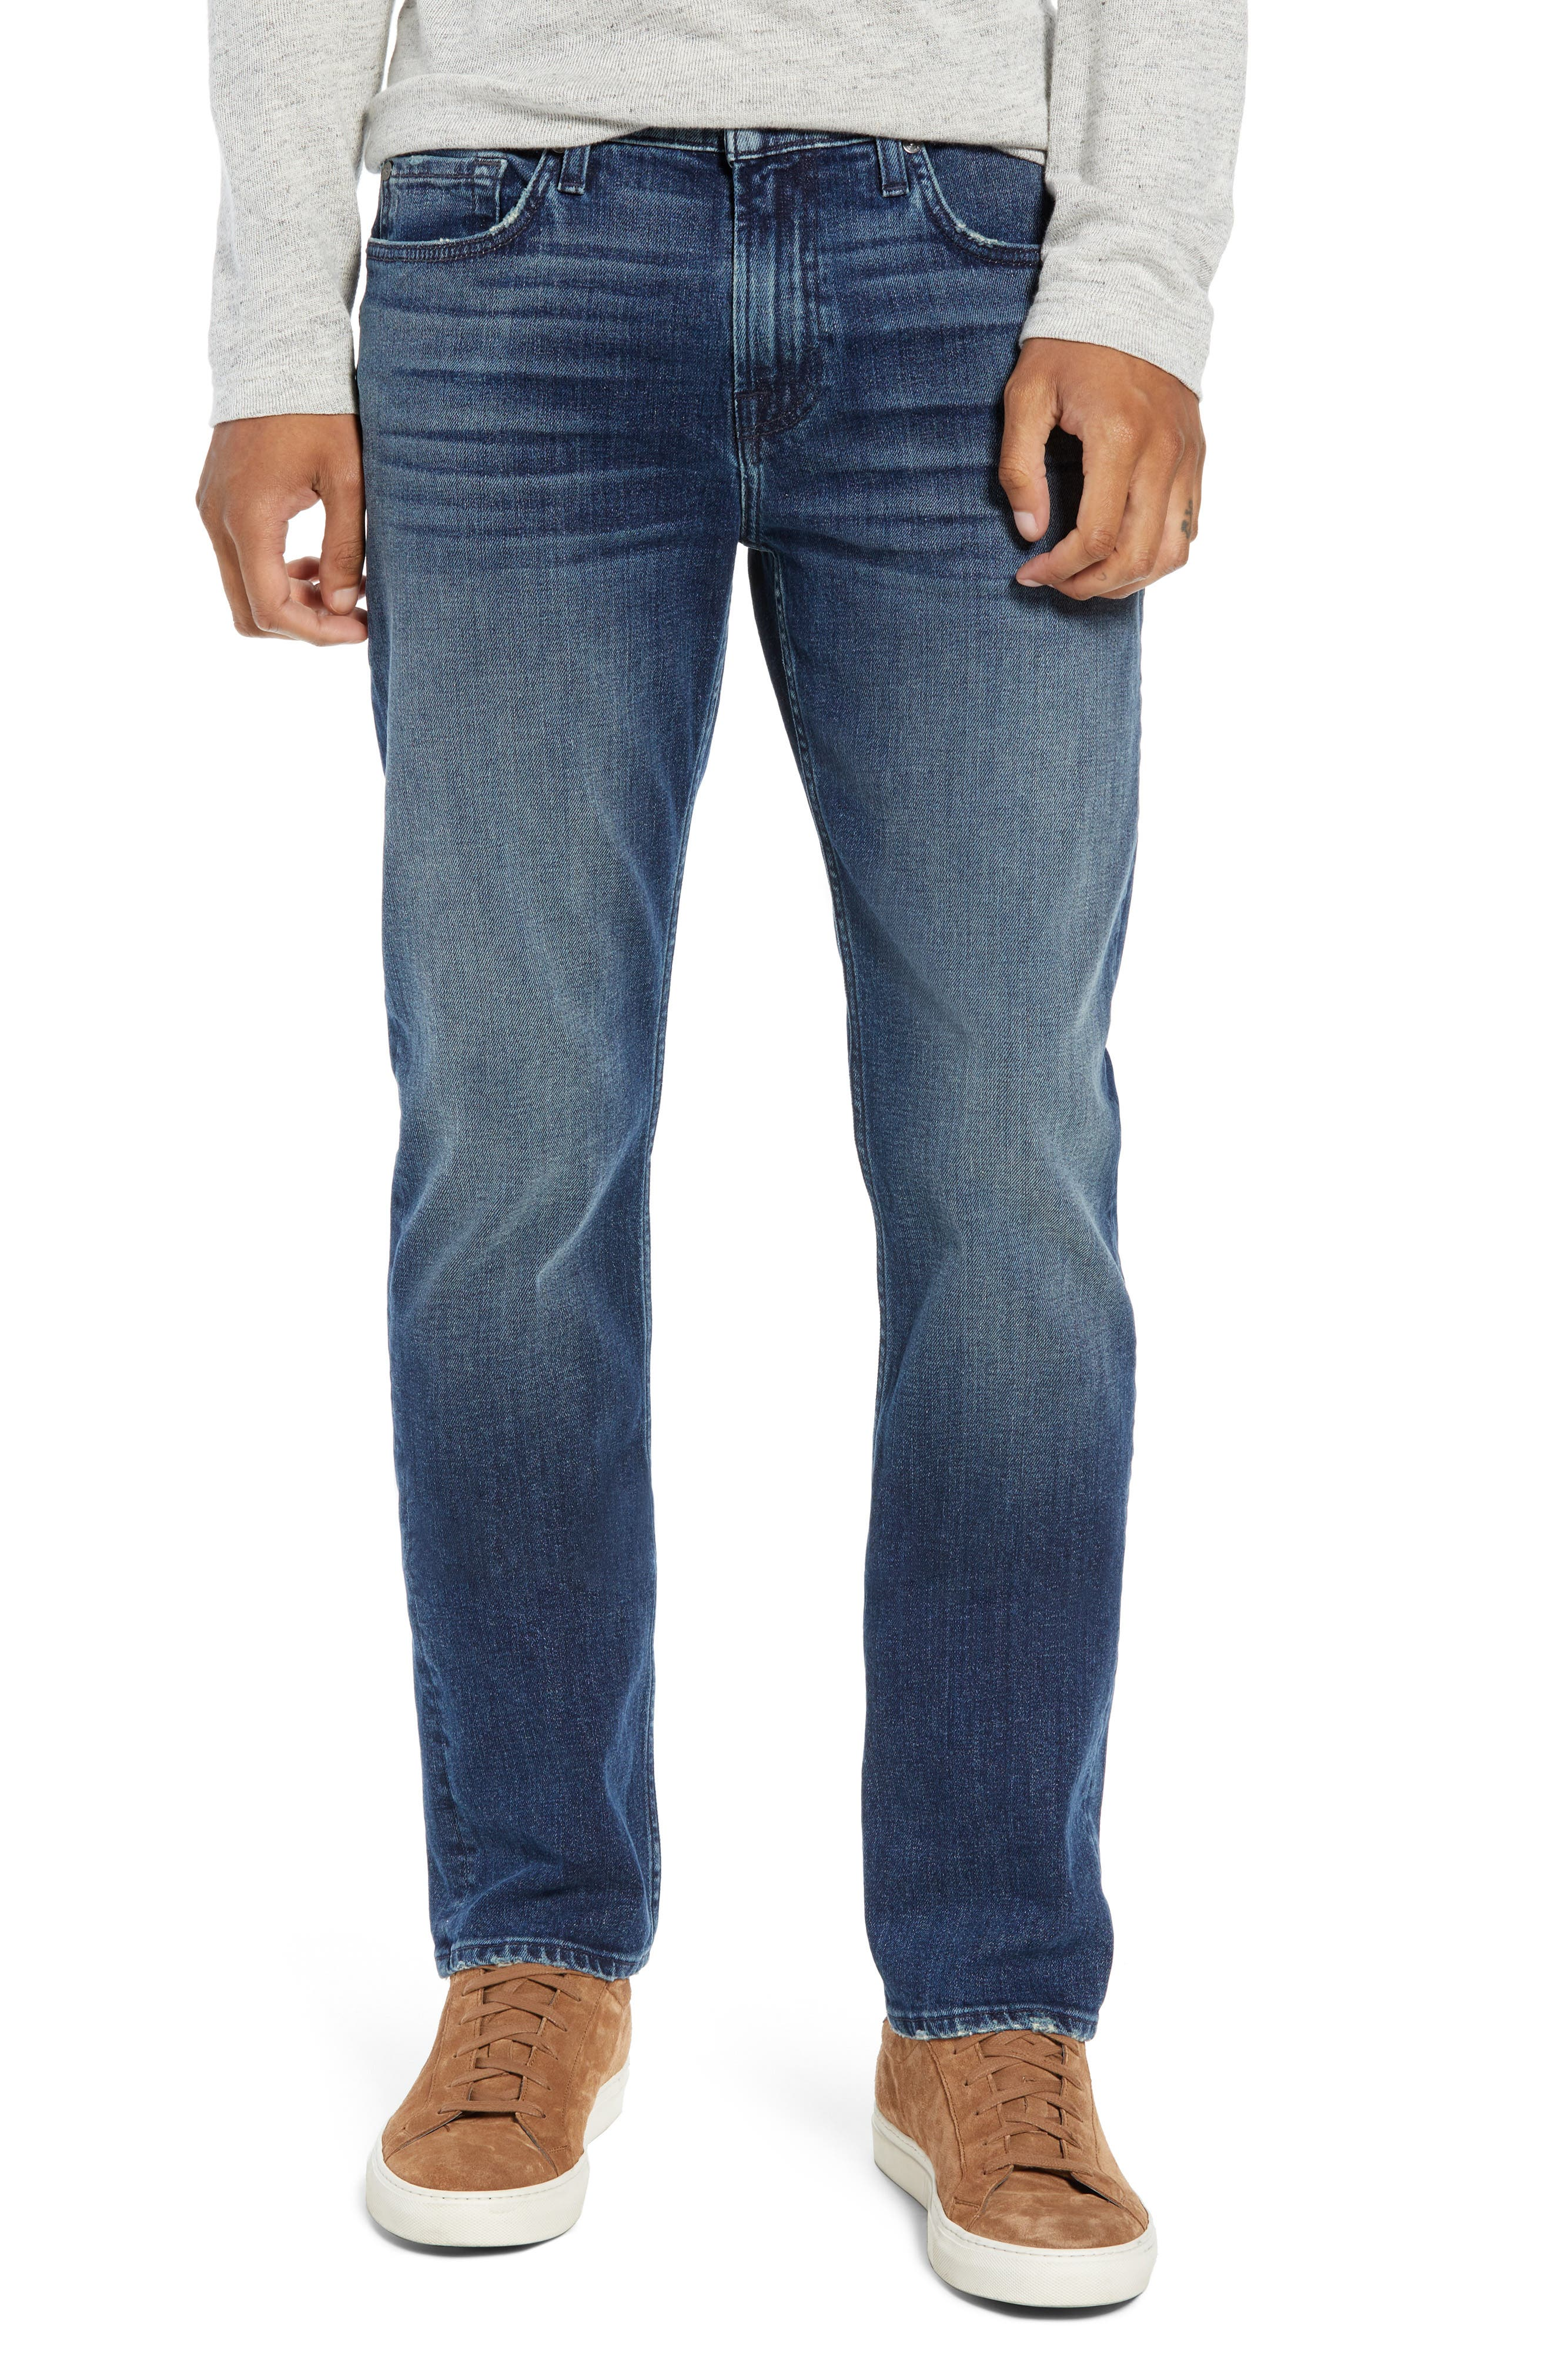 Slimmy Slim Fit Jeans,                             Main thumbnail 1, color,                             DRIFTER